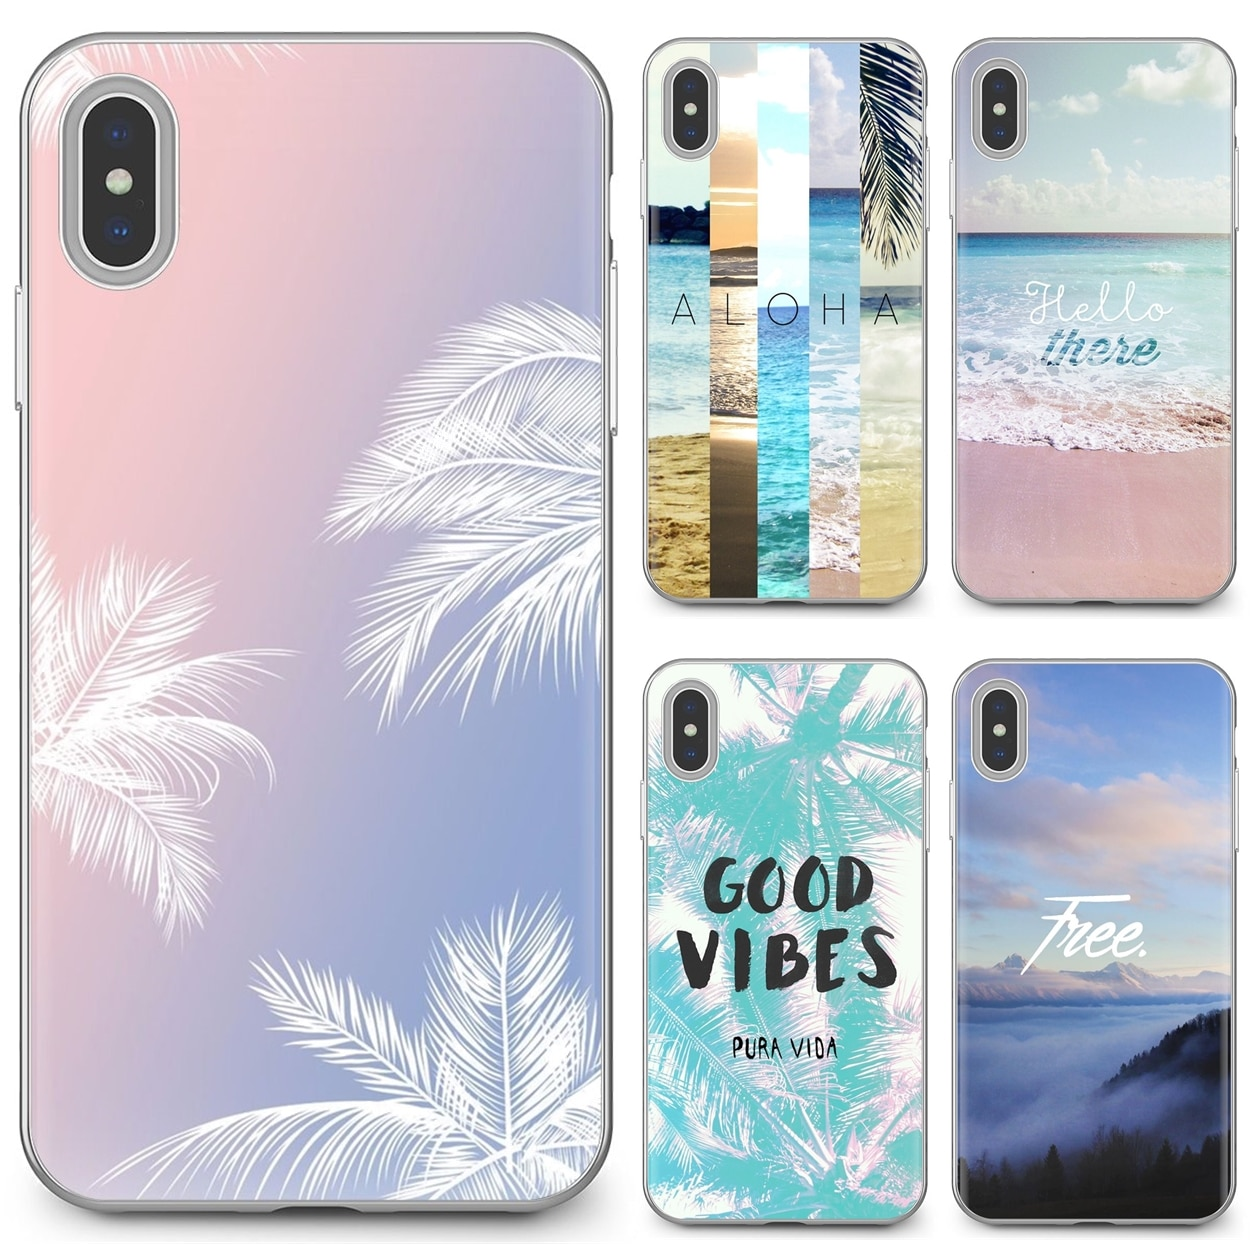 Aloha verano rayas papel Slim silicona cubierta de teléfono de TPU suave para Huawei Honor Y5 2018 2019 8S 9X Pro 20 10 10i Lite